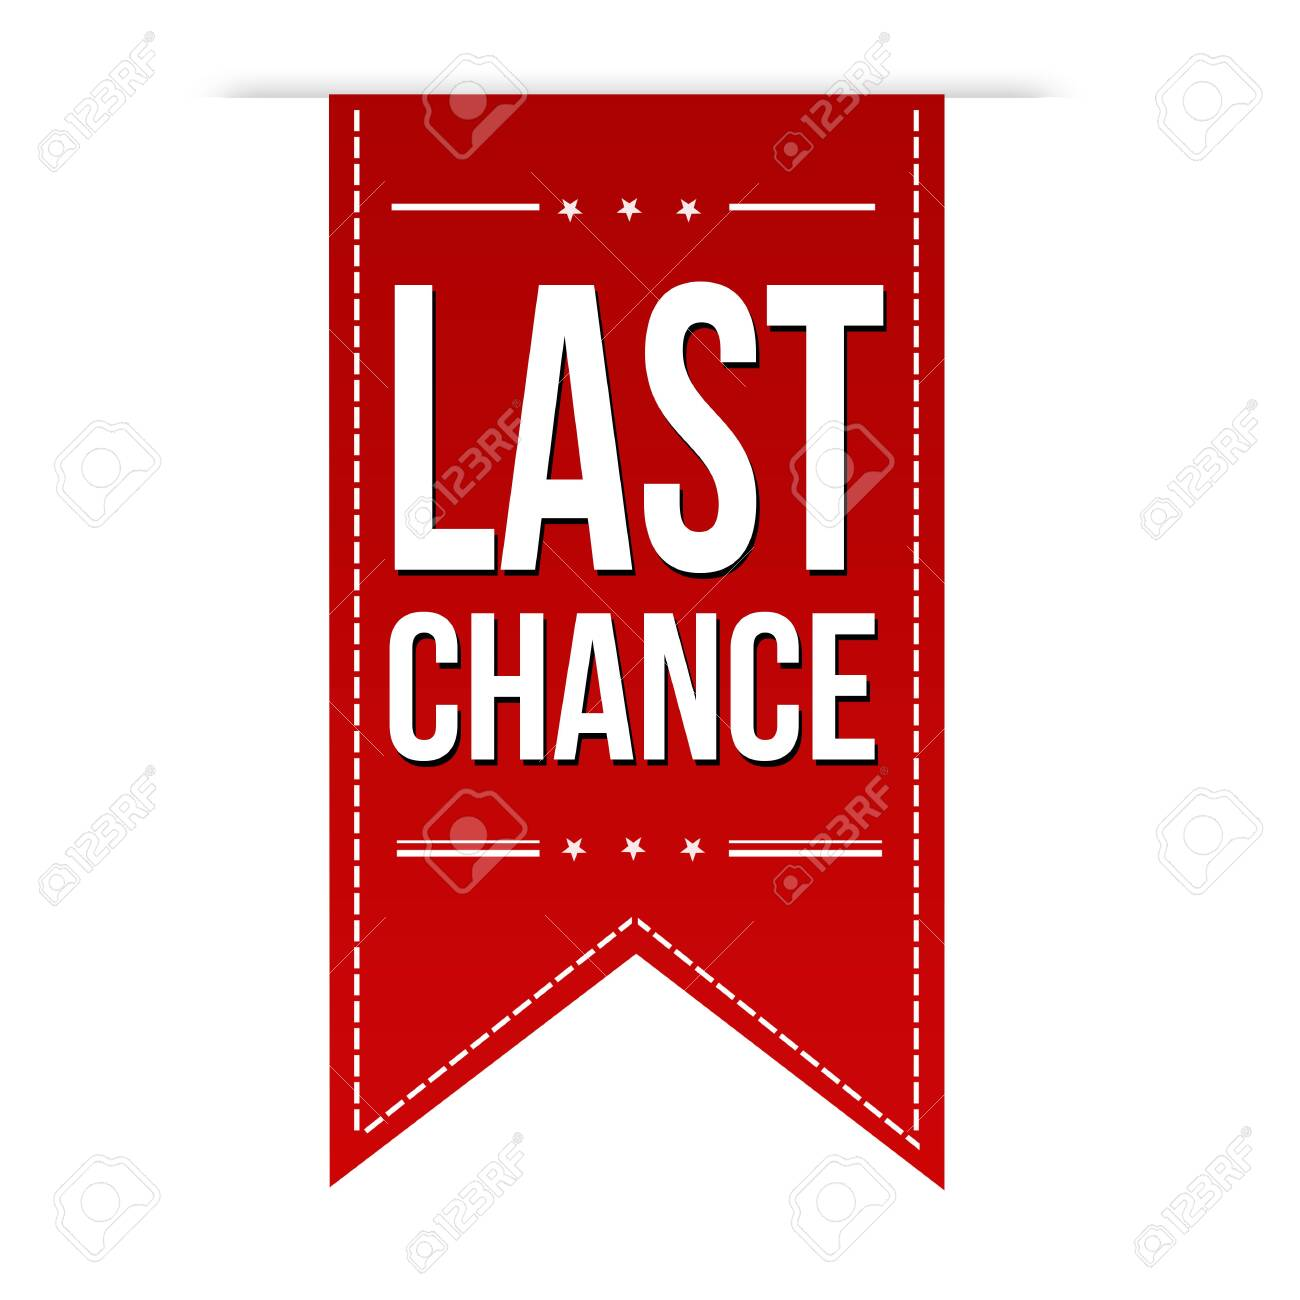 Last chance banner design on white background, vector illustration - 155346952